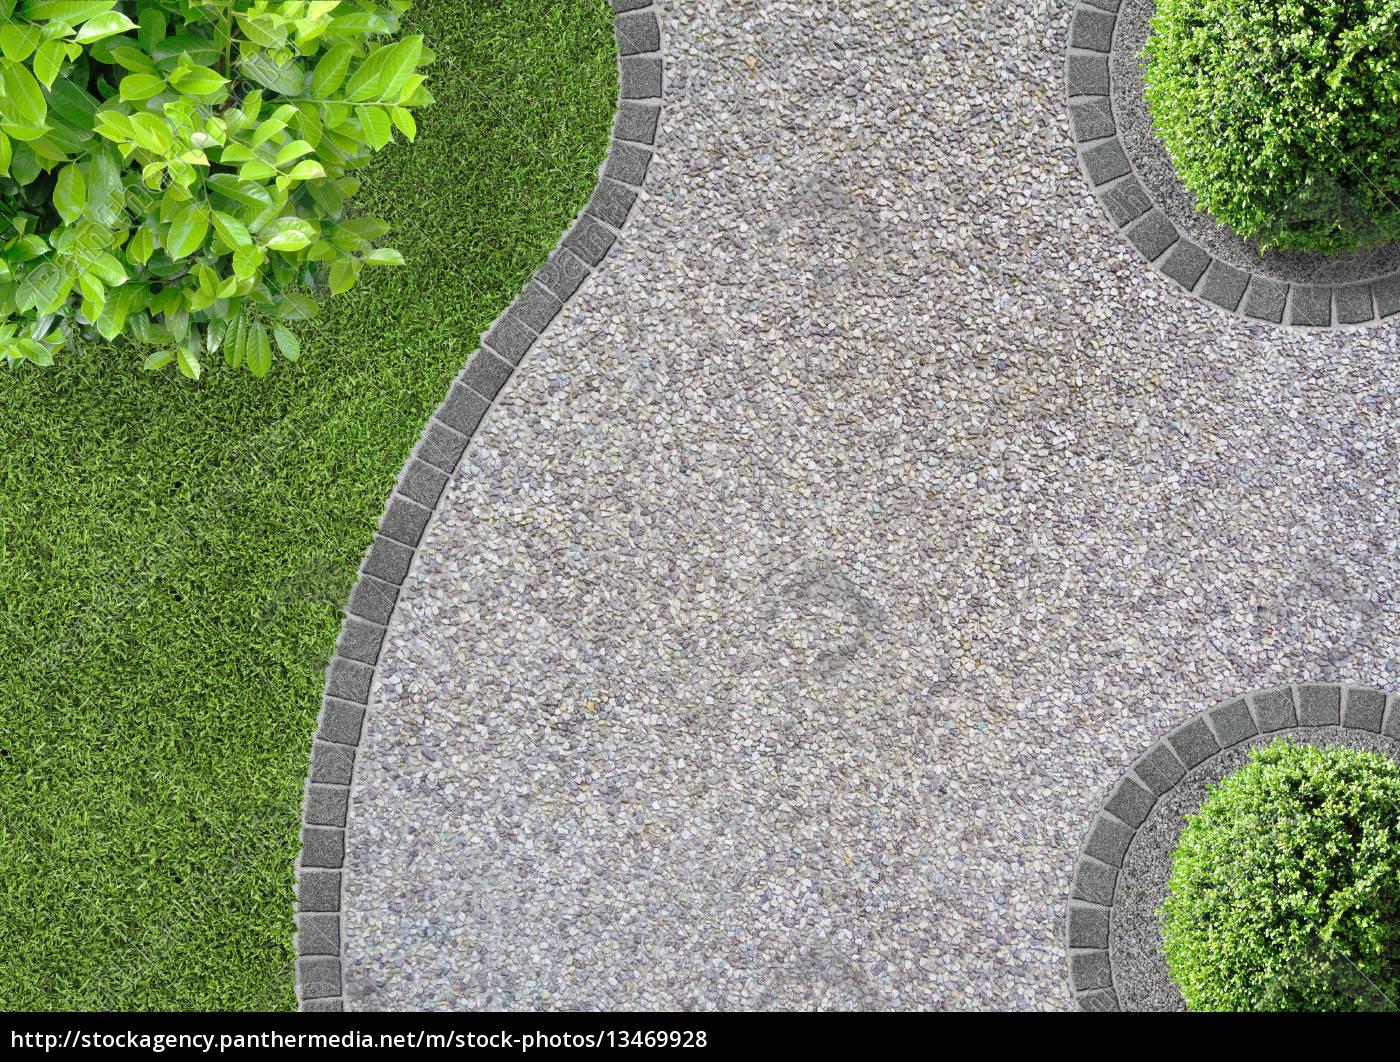 kies weg im garten, kiesweg im garten oder park in der vogelperspektive - lizenzfreies, Design ideen